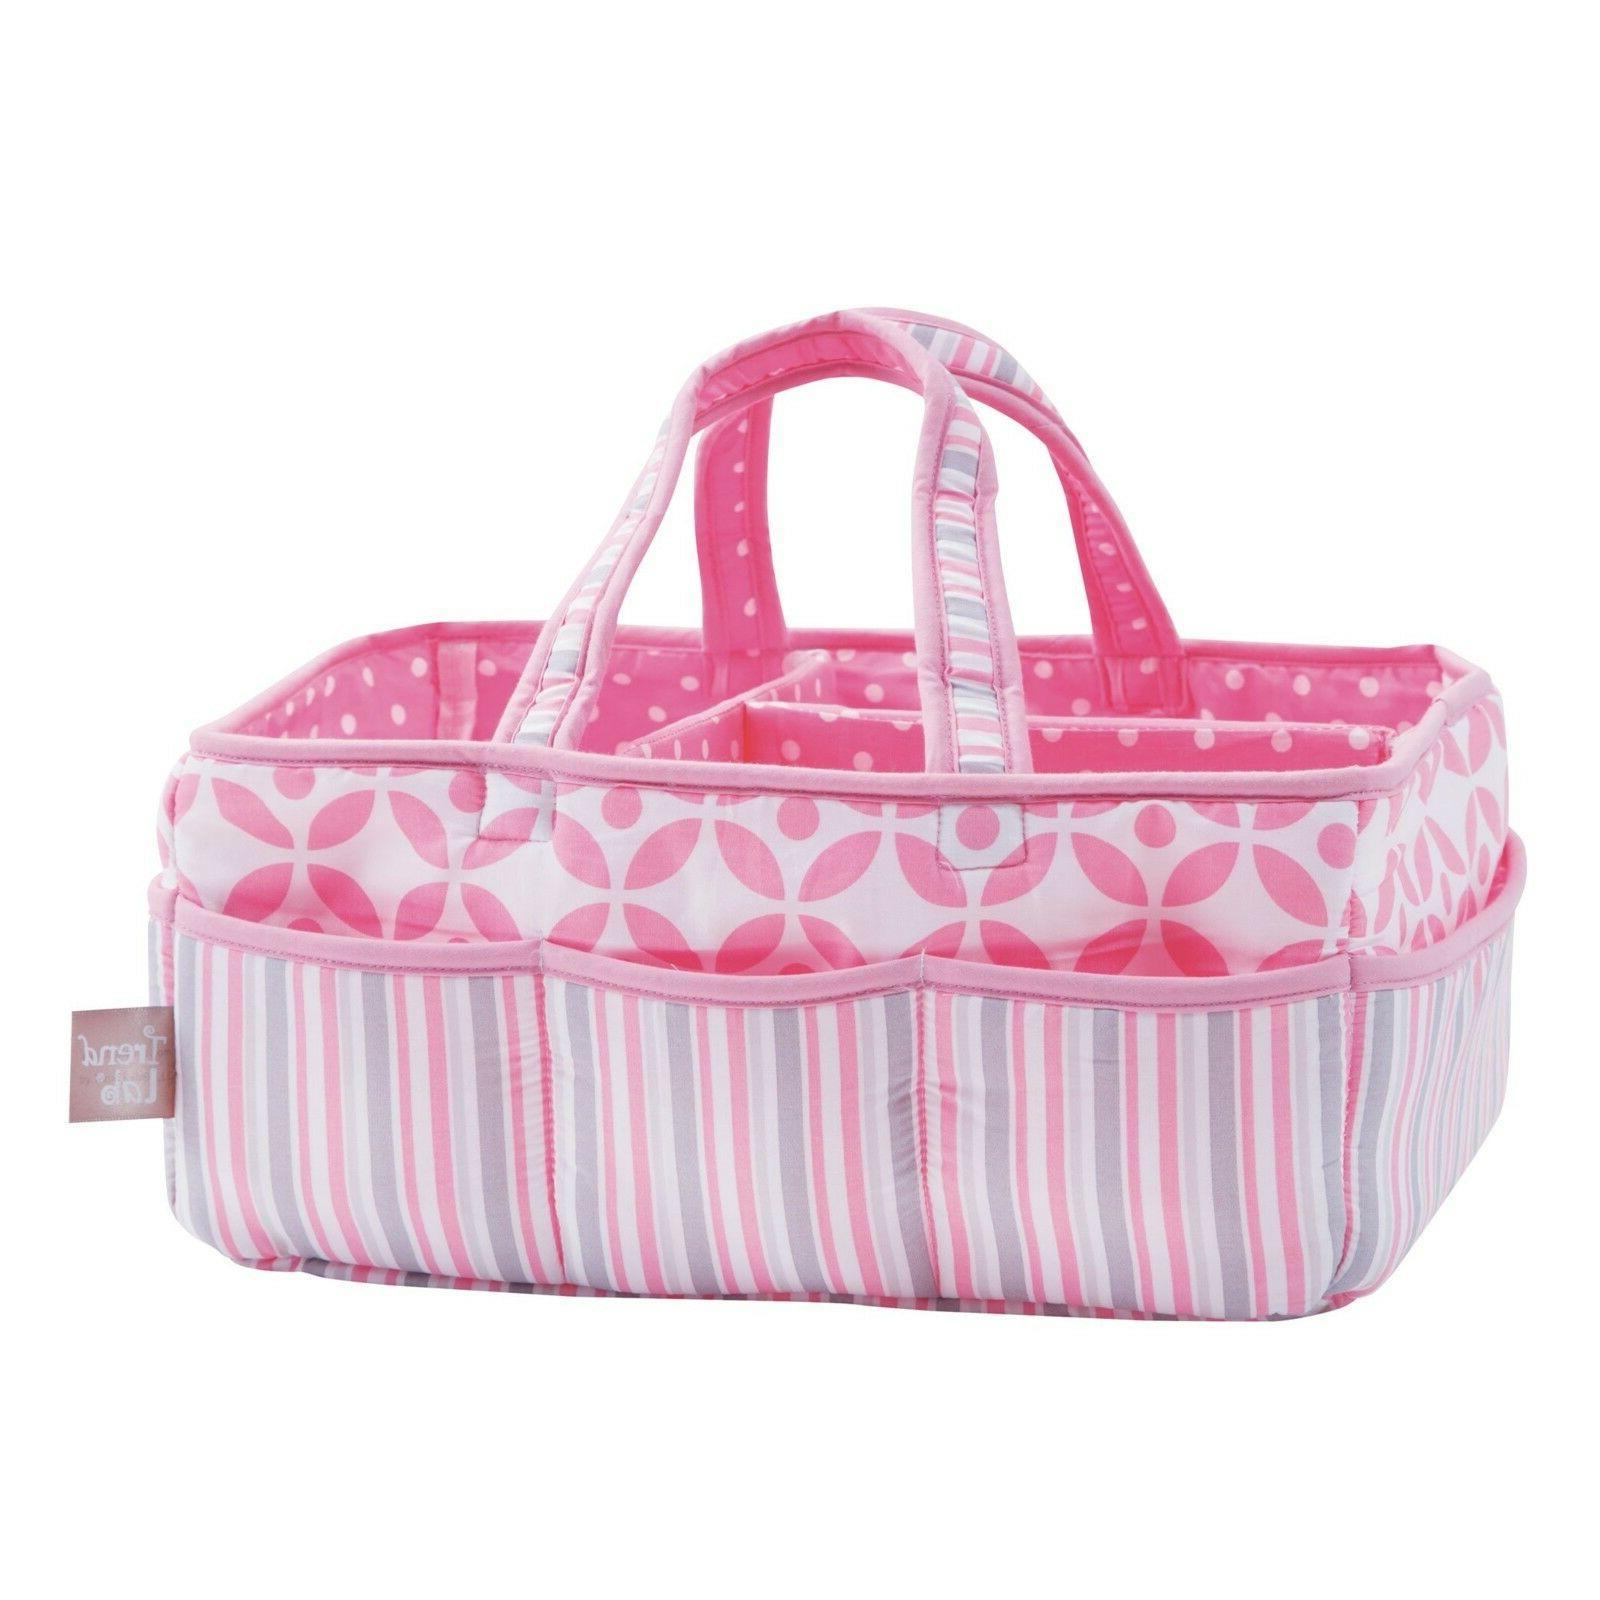 Trend Lab Lily Storage Caddy, Pink